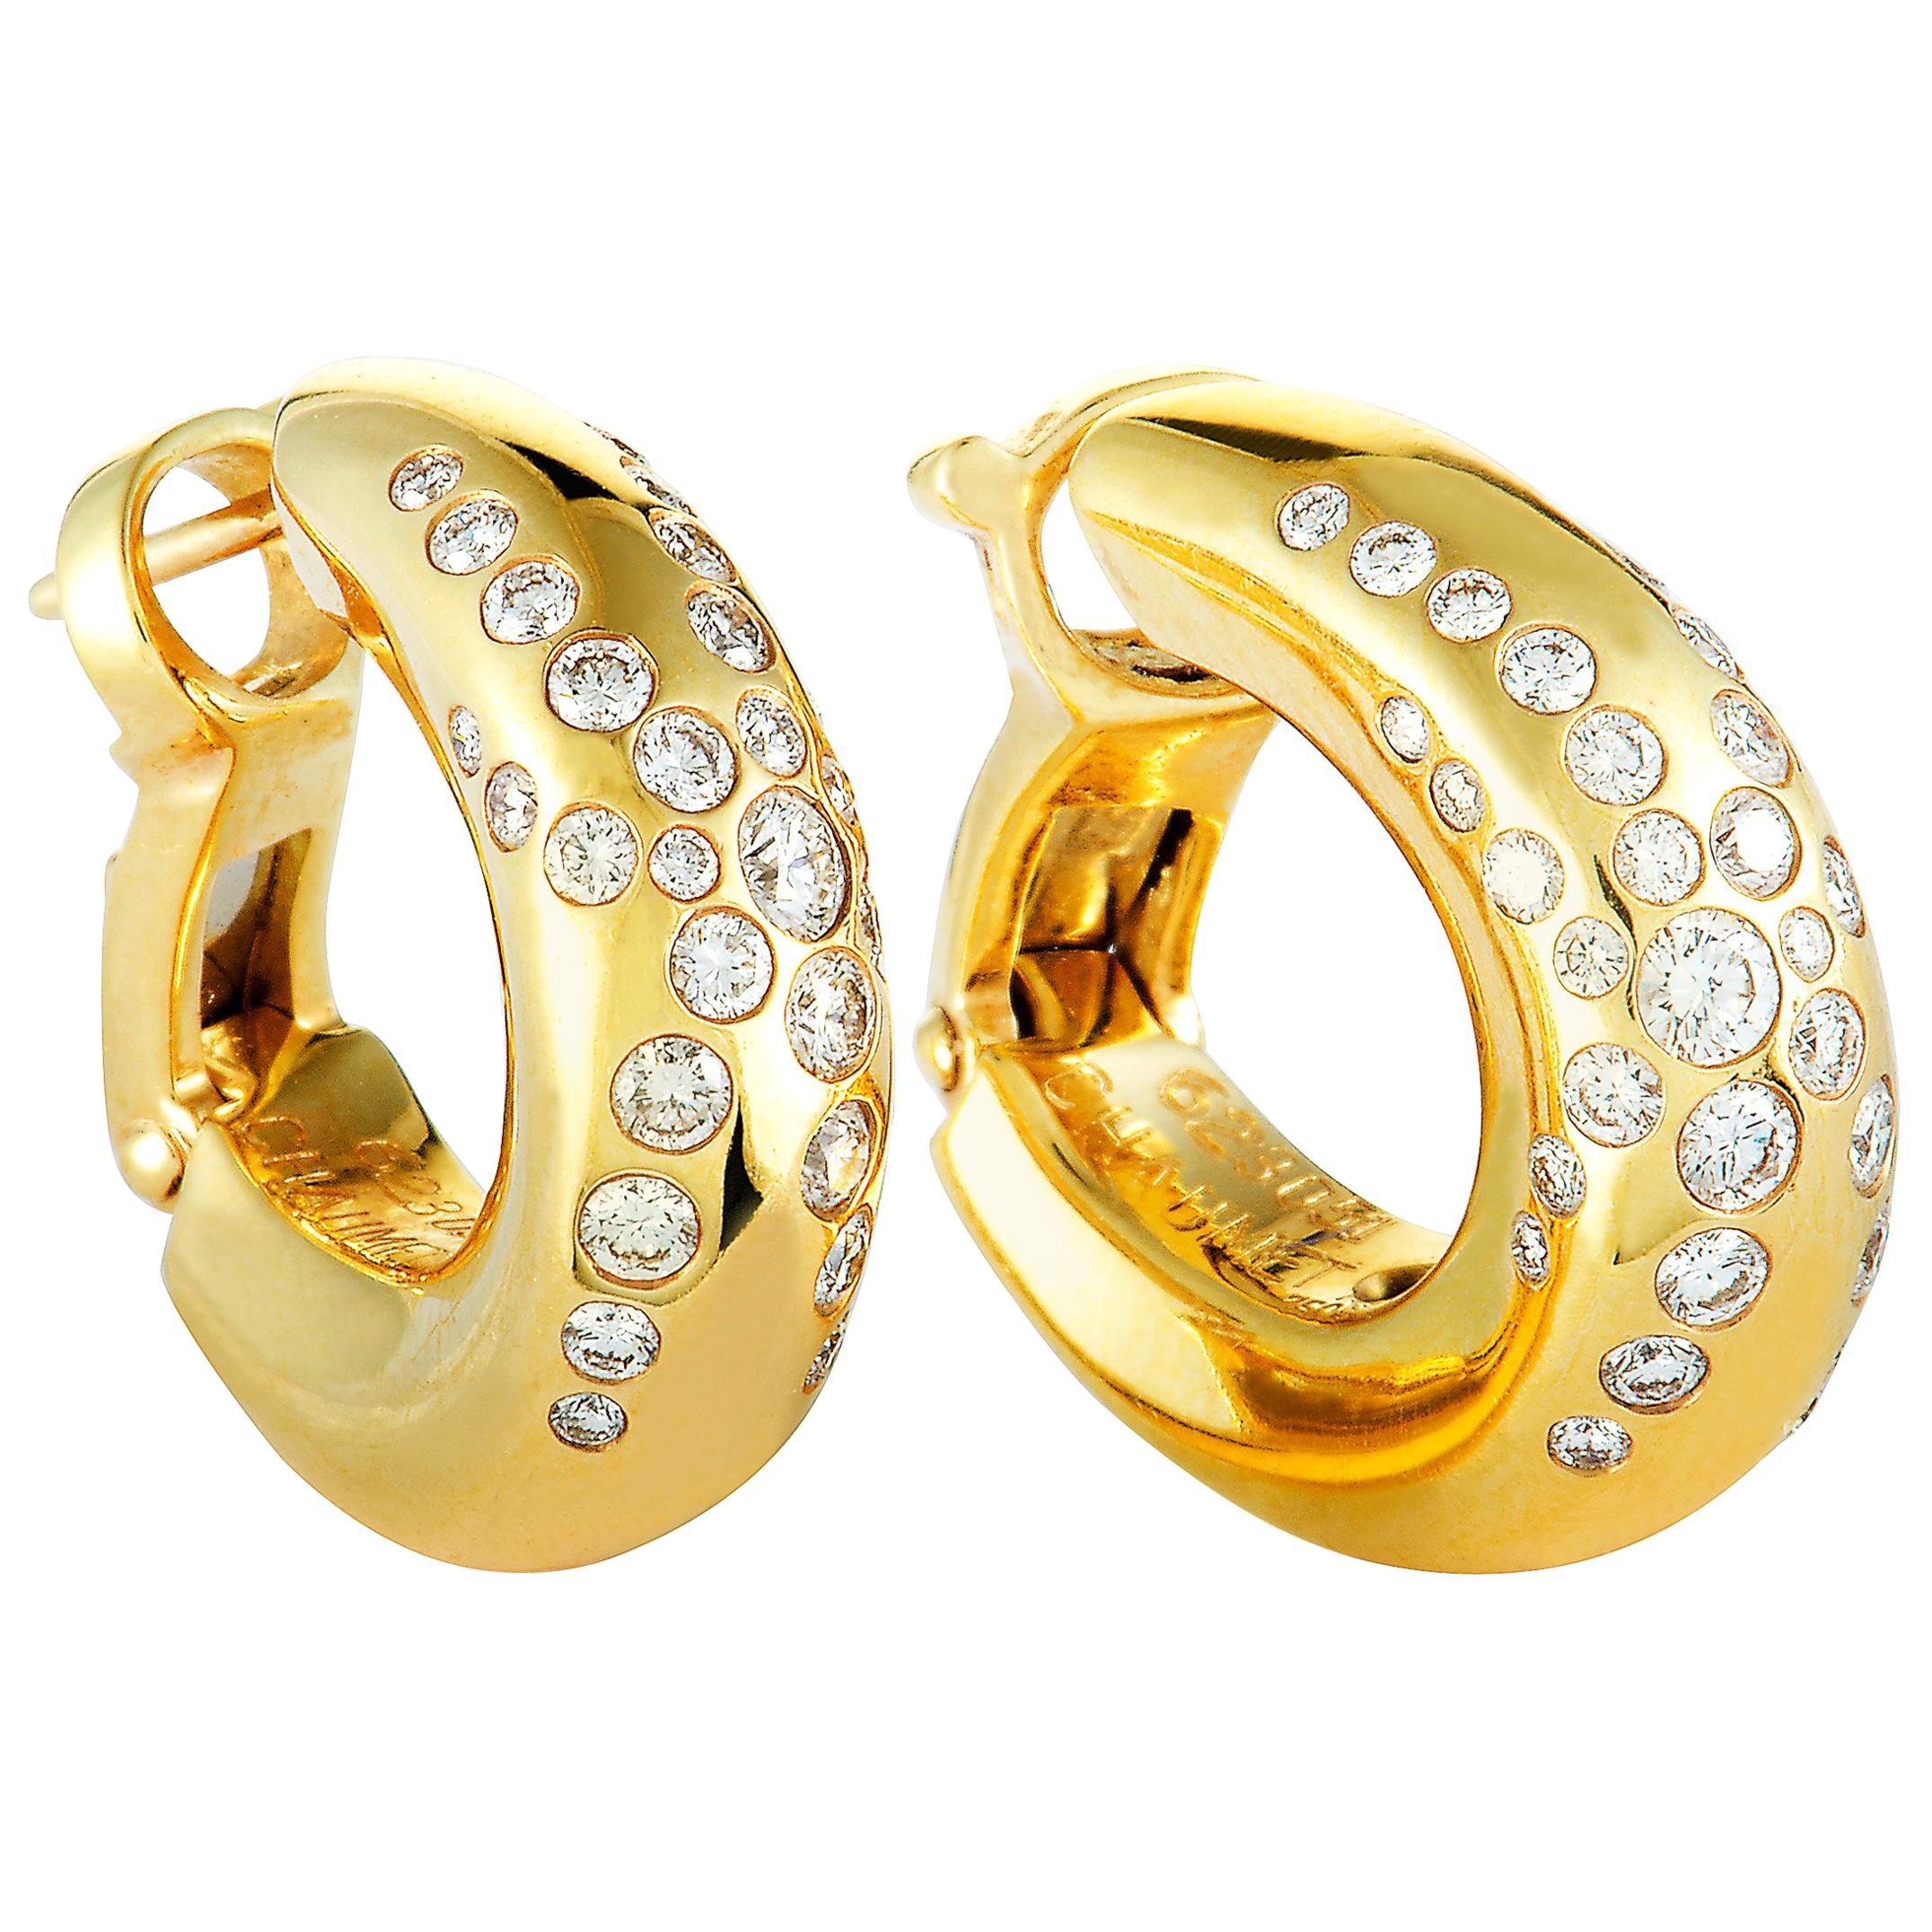 331bd59c581ff Chaumet Diamond Yellow Gold Omega Back Earrings